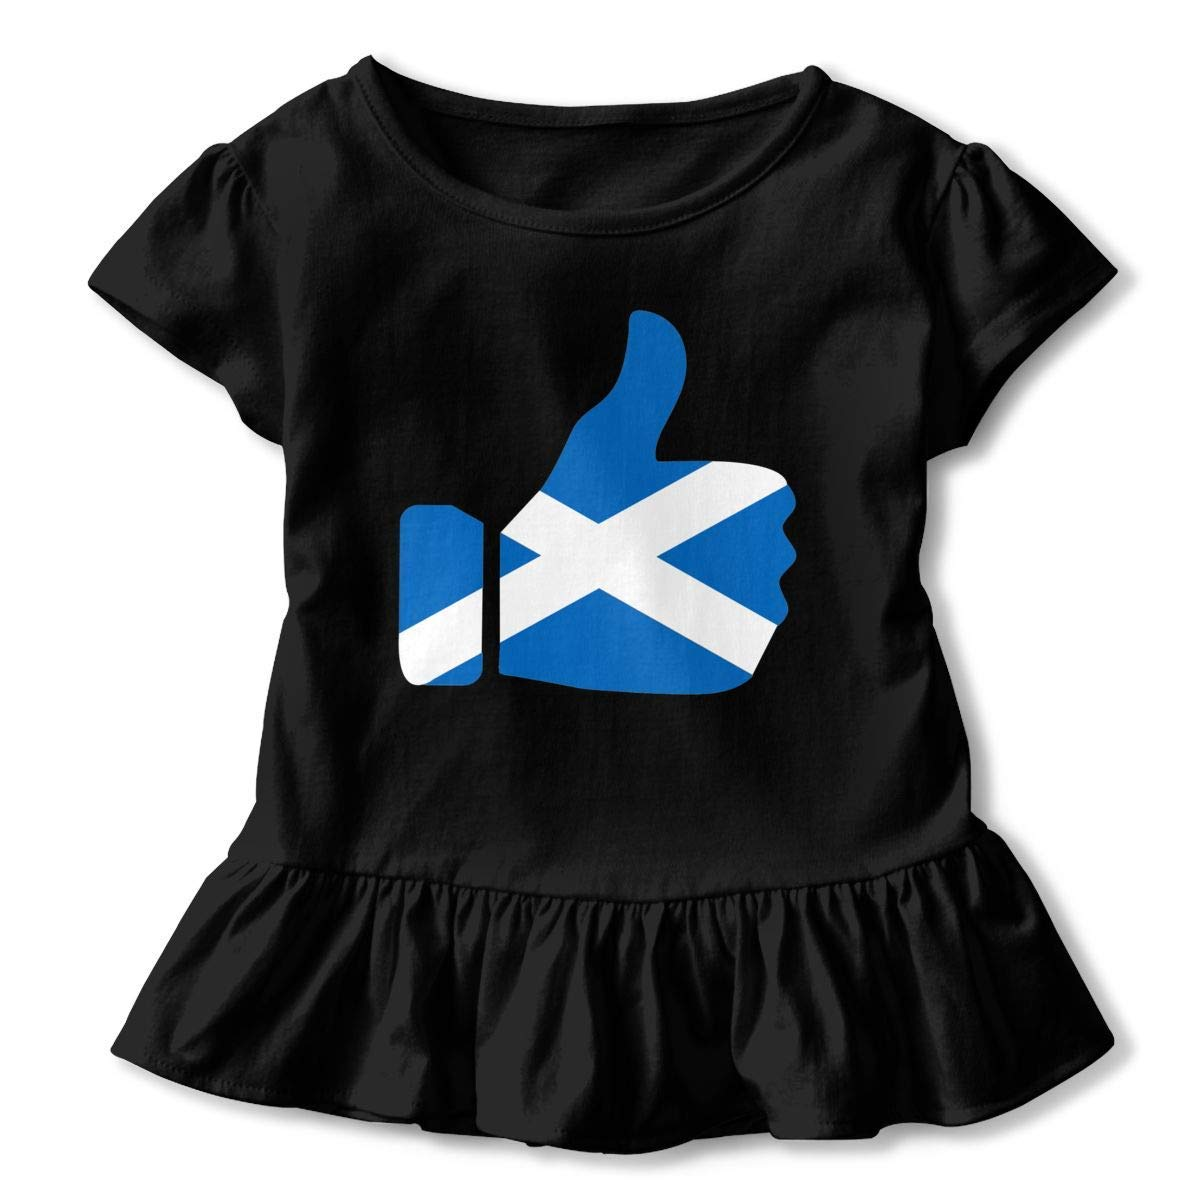 lu fangfangc Flag of Scotland Thumb Signal T-Shirt Kids Flounced T Shirts Comfort Shirt Dress for 2-6T Kids Girls